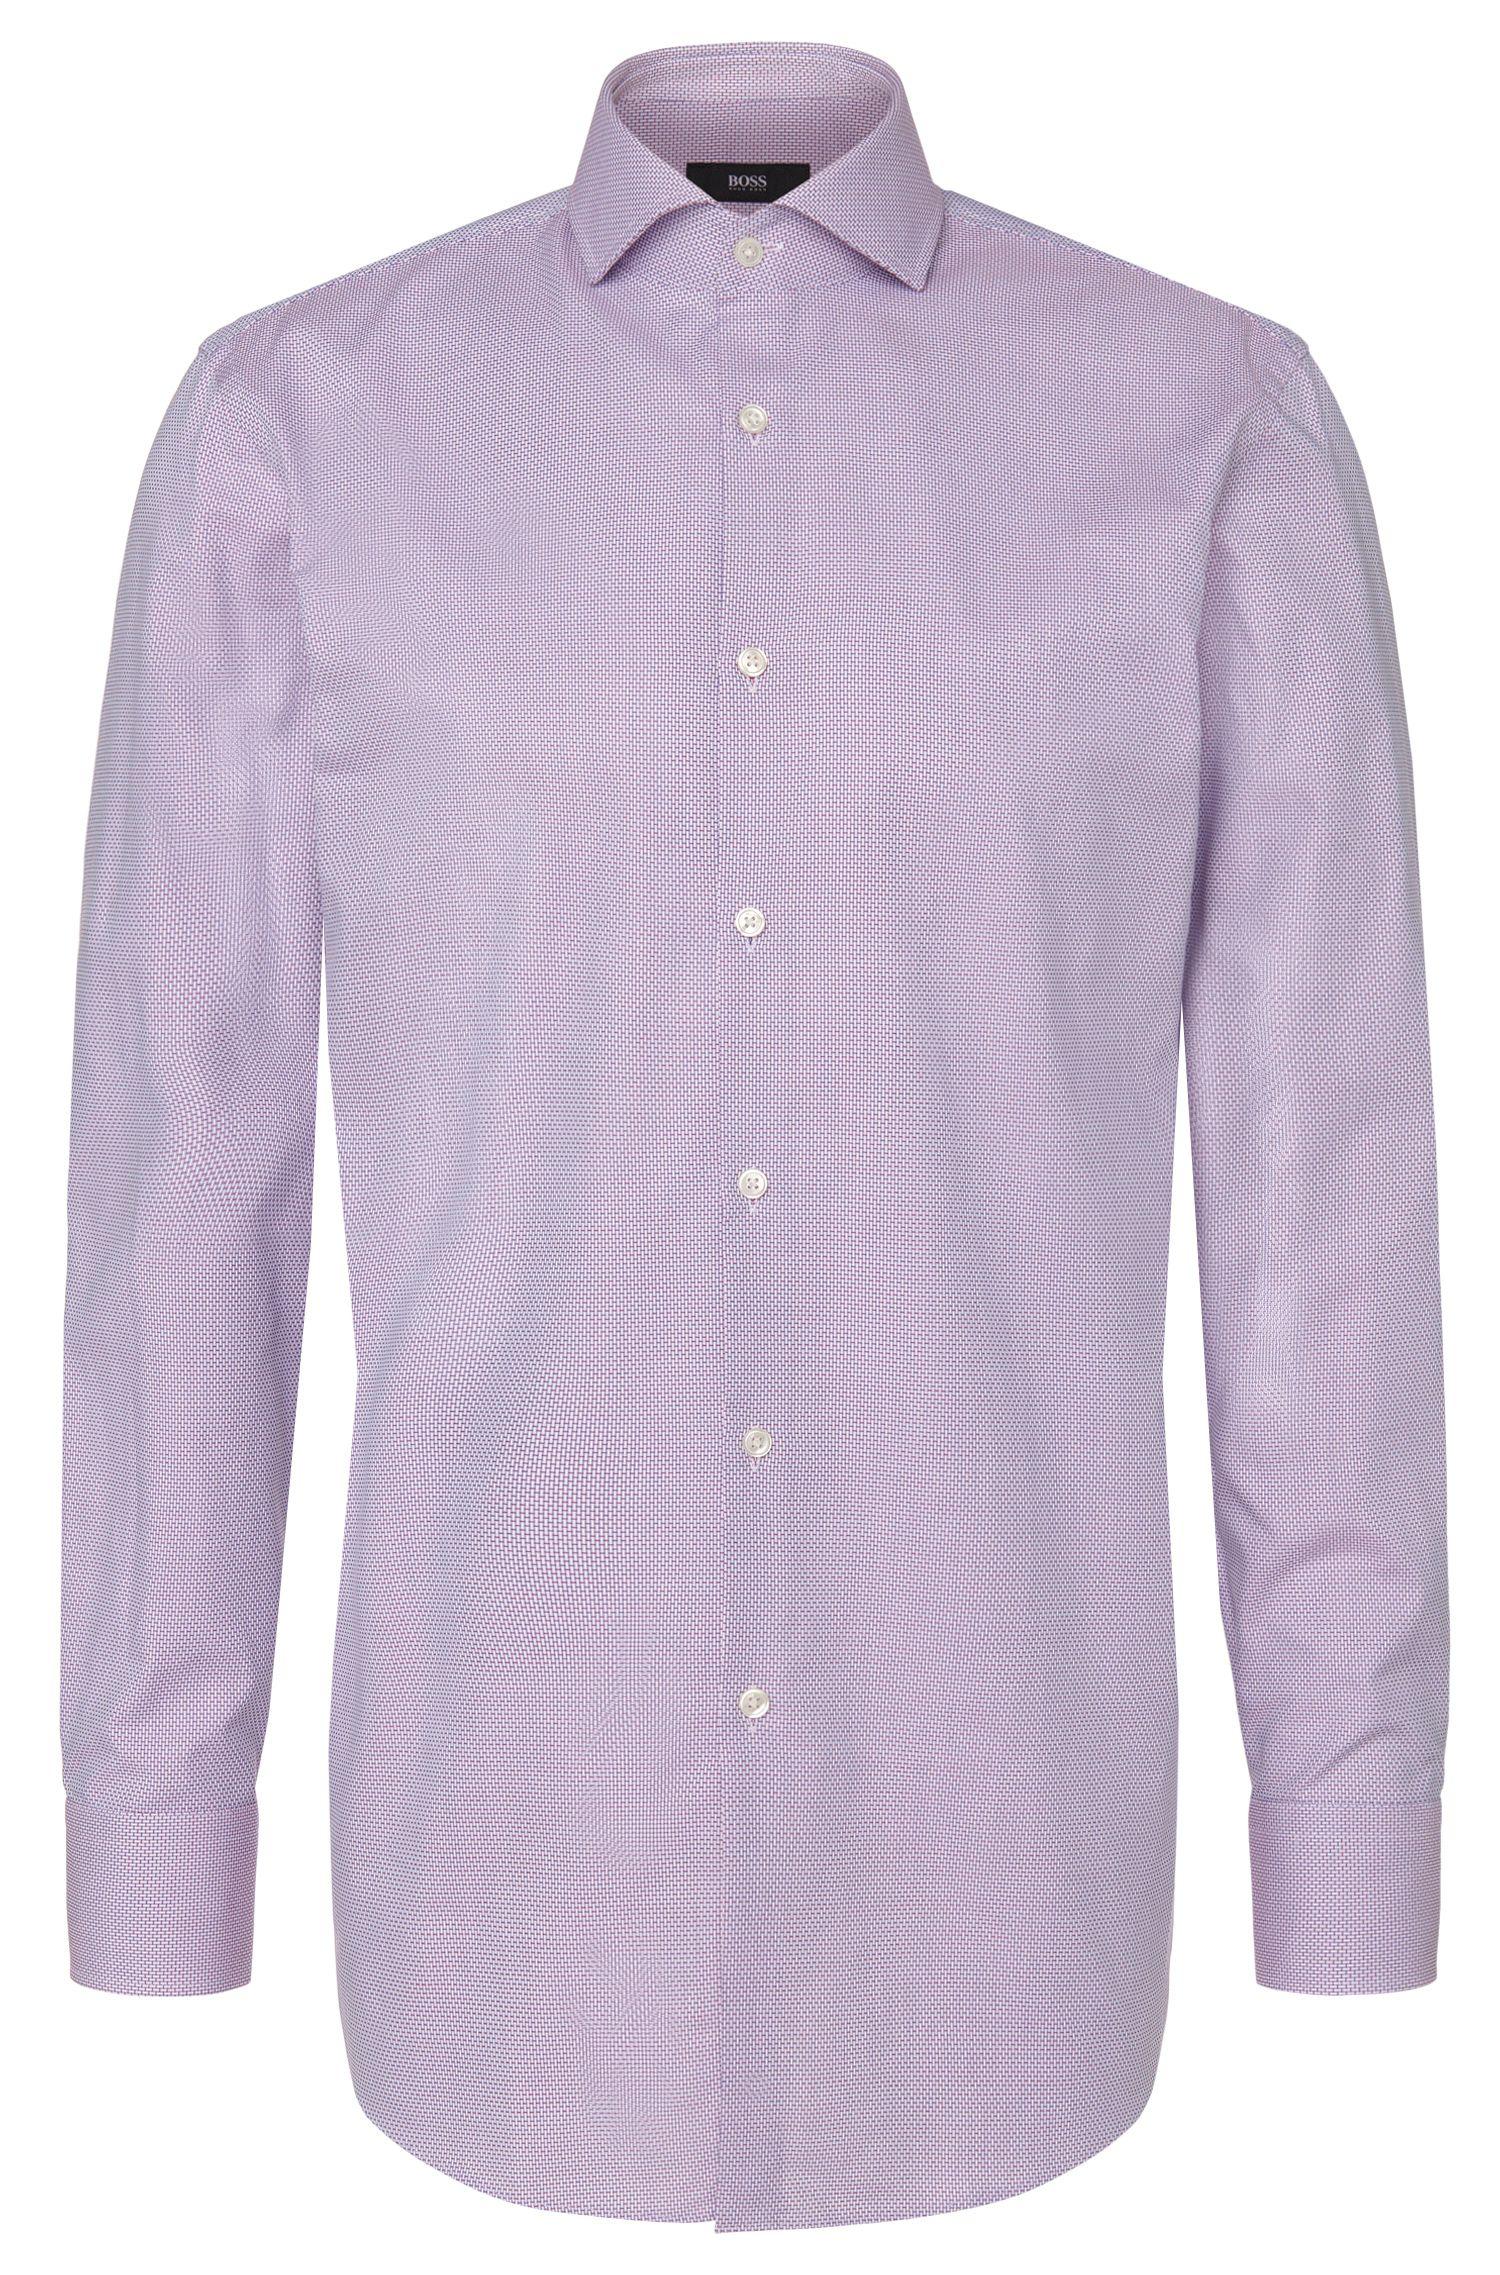 'Mark US' | Sharp Fit, Cotton Patterned Dress Shirt